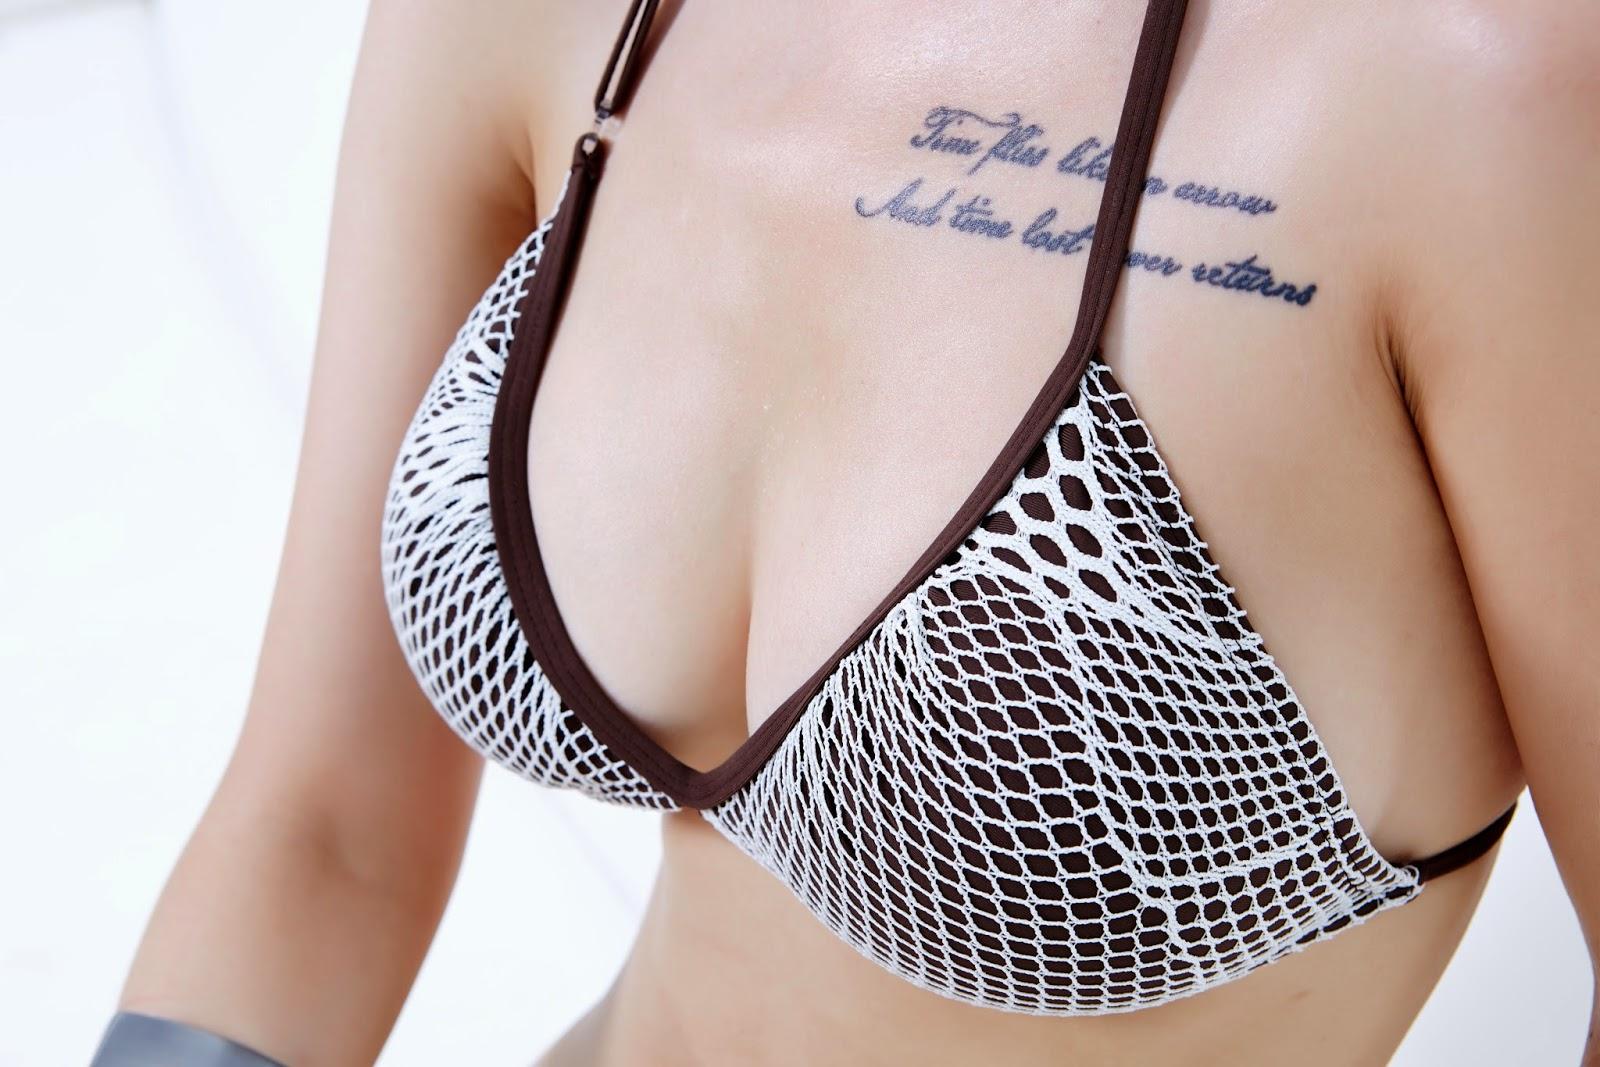 Hasil operasi plastik payudara artis Korea di Wonjin